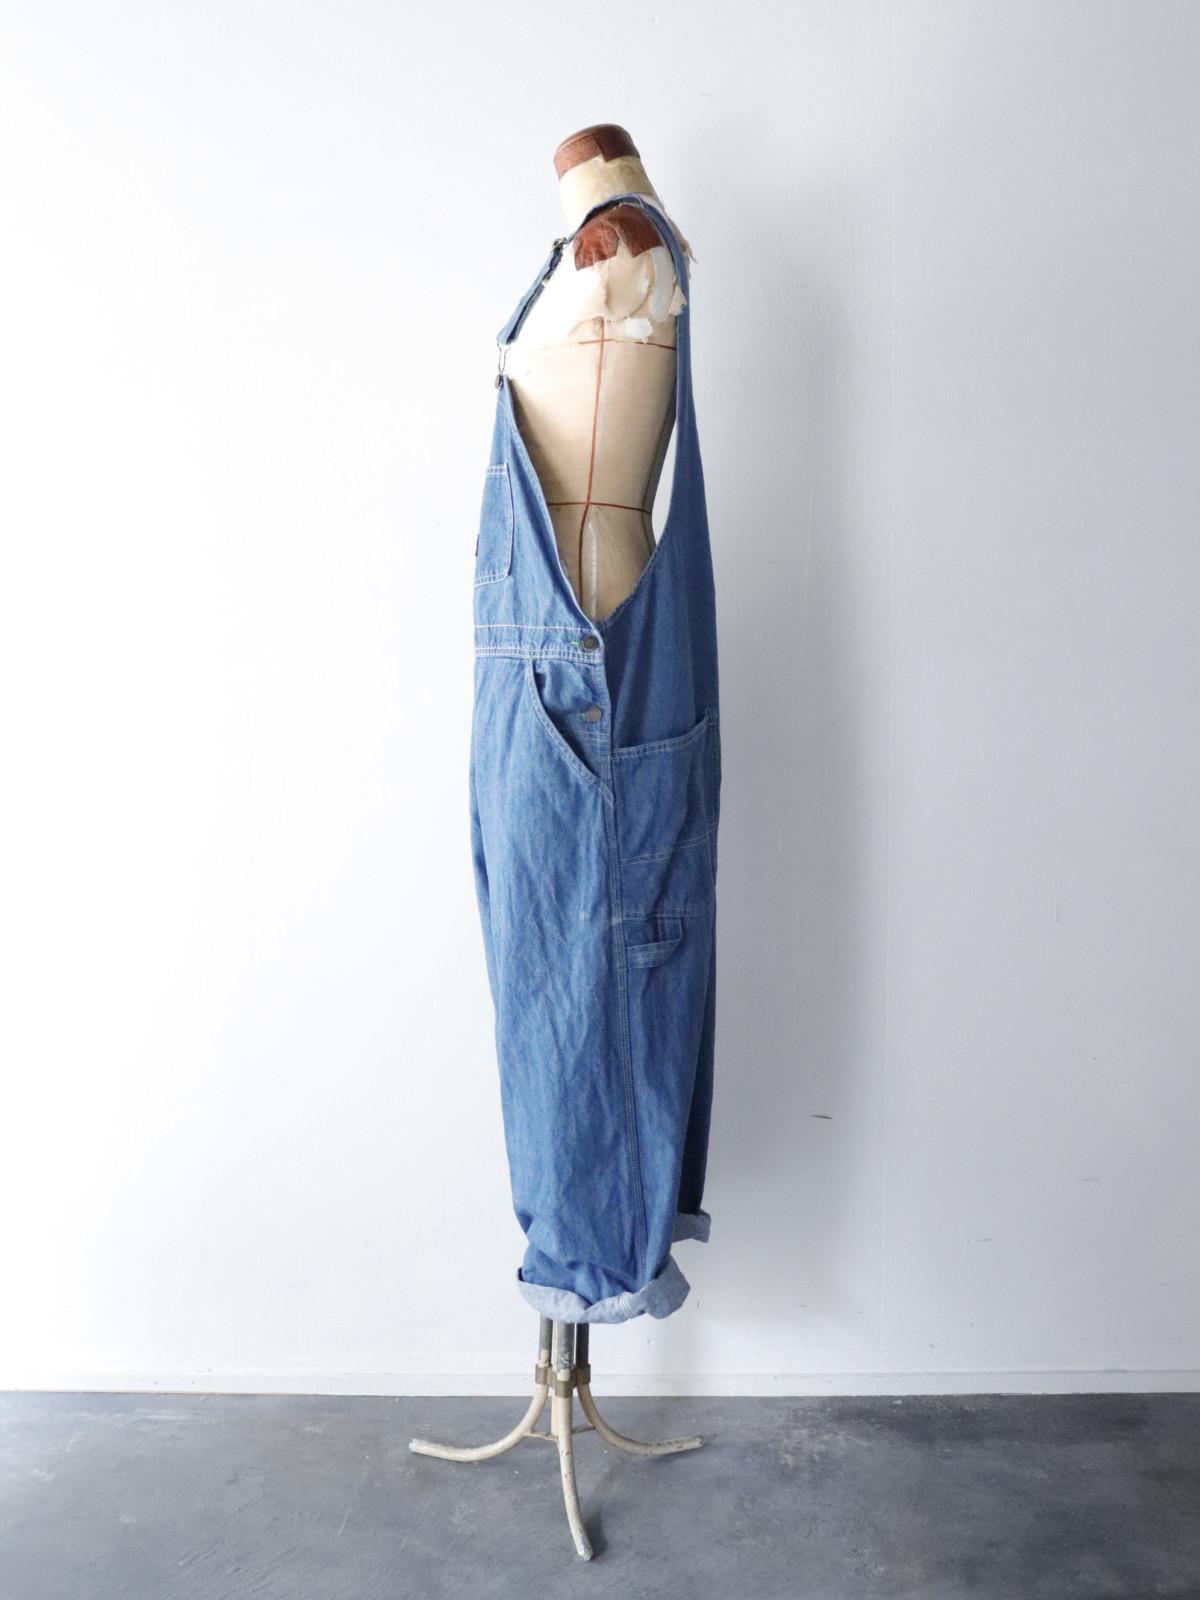 Osh Kosh B'gosh, denim overalls,USA